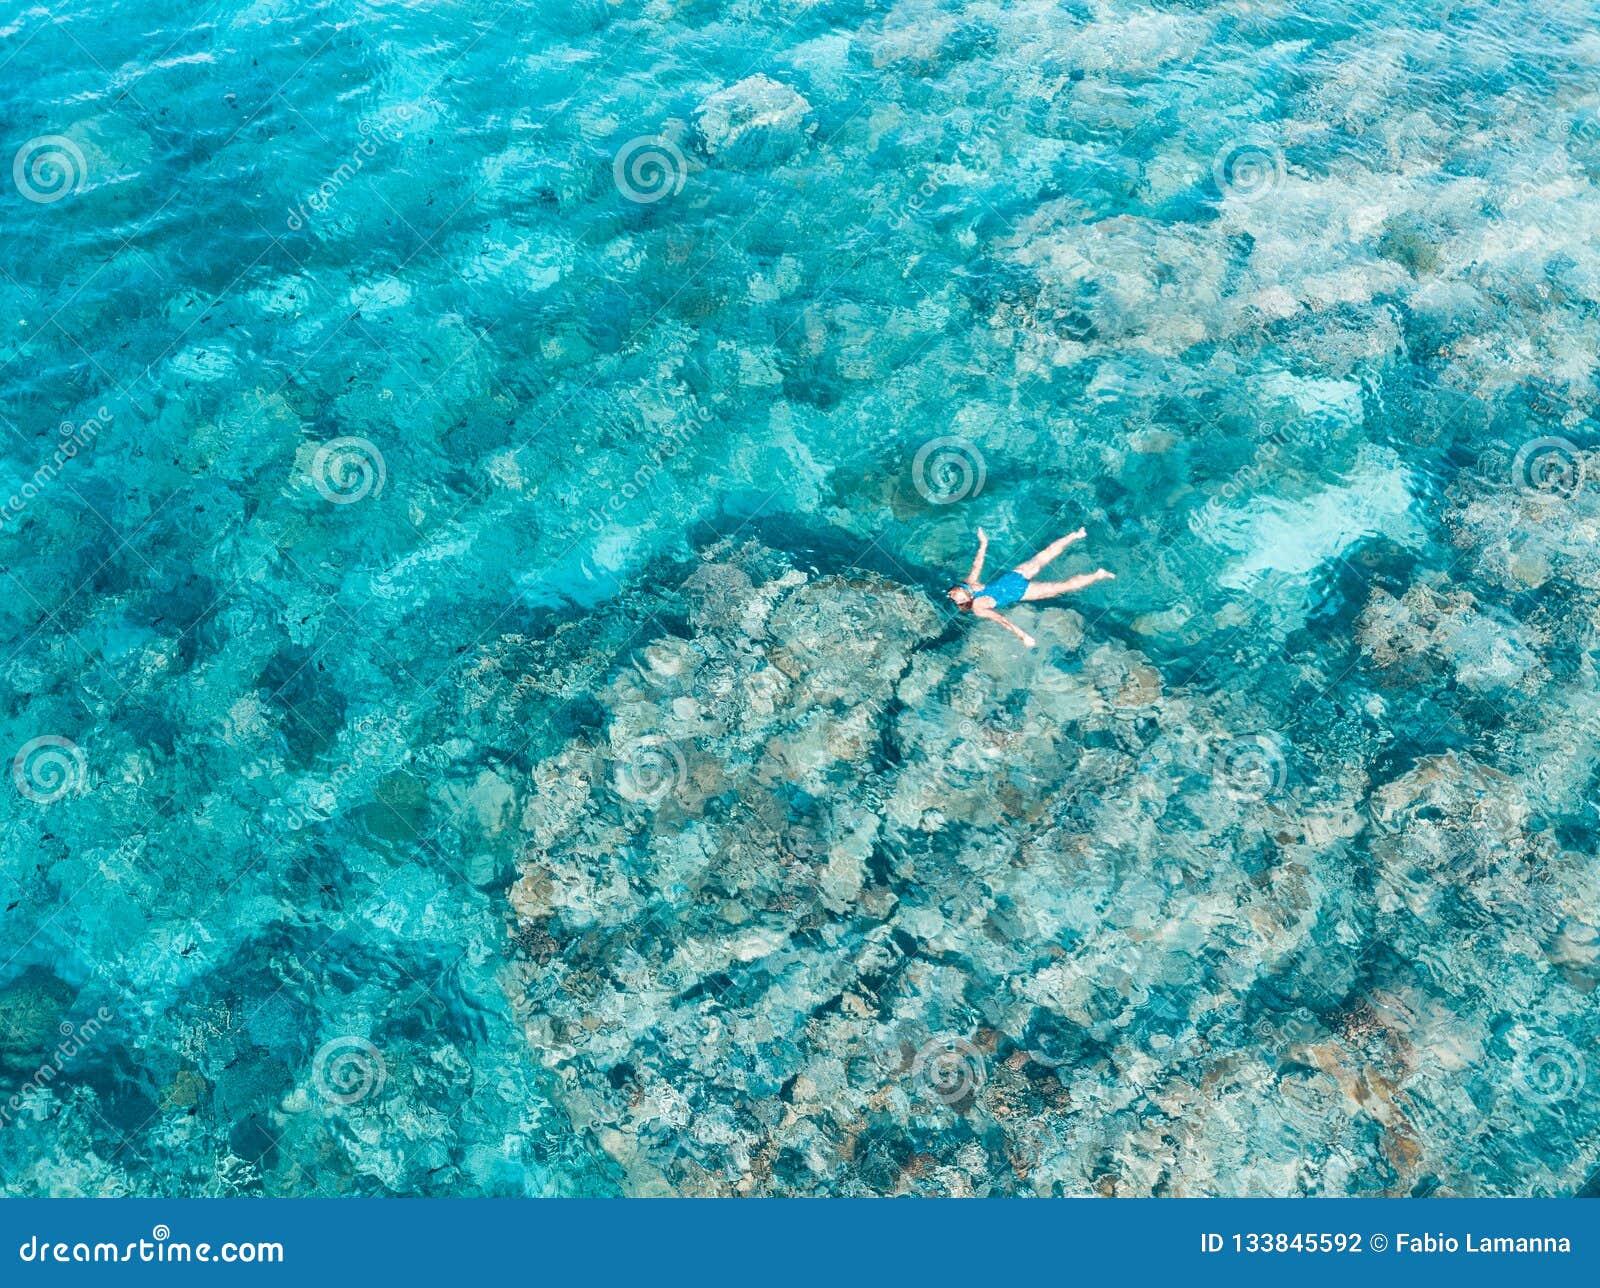 Aerial top down people snorkeling on coral reef tropical caribbean sea, turquoise blue water. Indonesia Wakatobi archipelago,